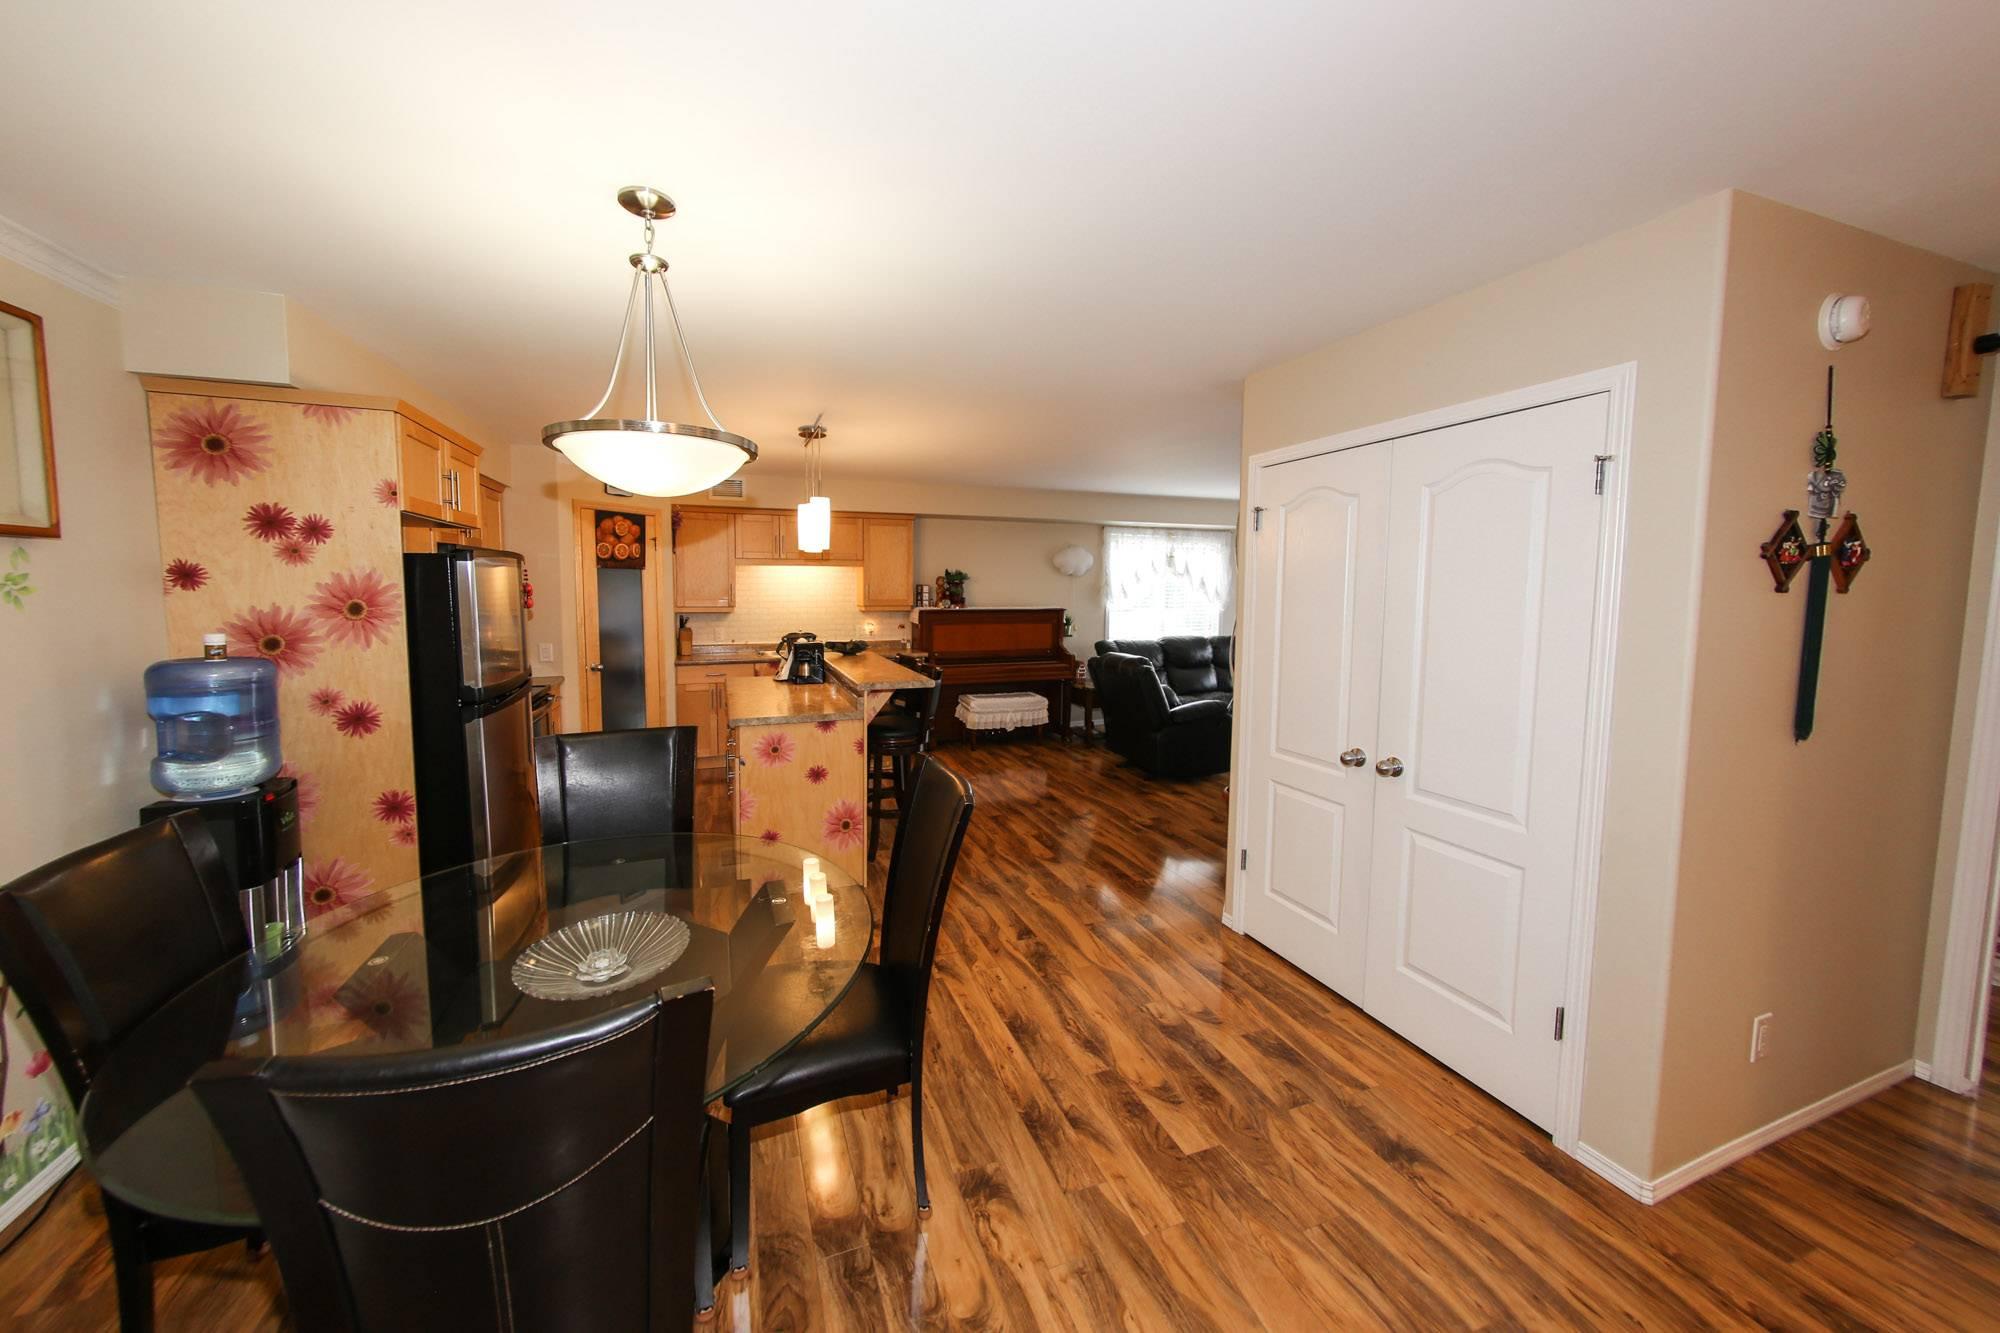 336-701 St Annes, Winnipeg, Manitoba  R2M 3B3 - Photo 3 - 1825923